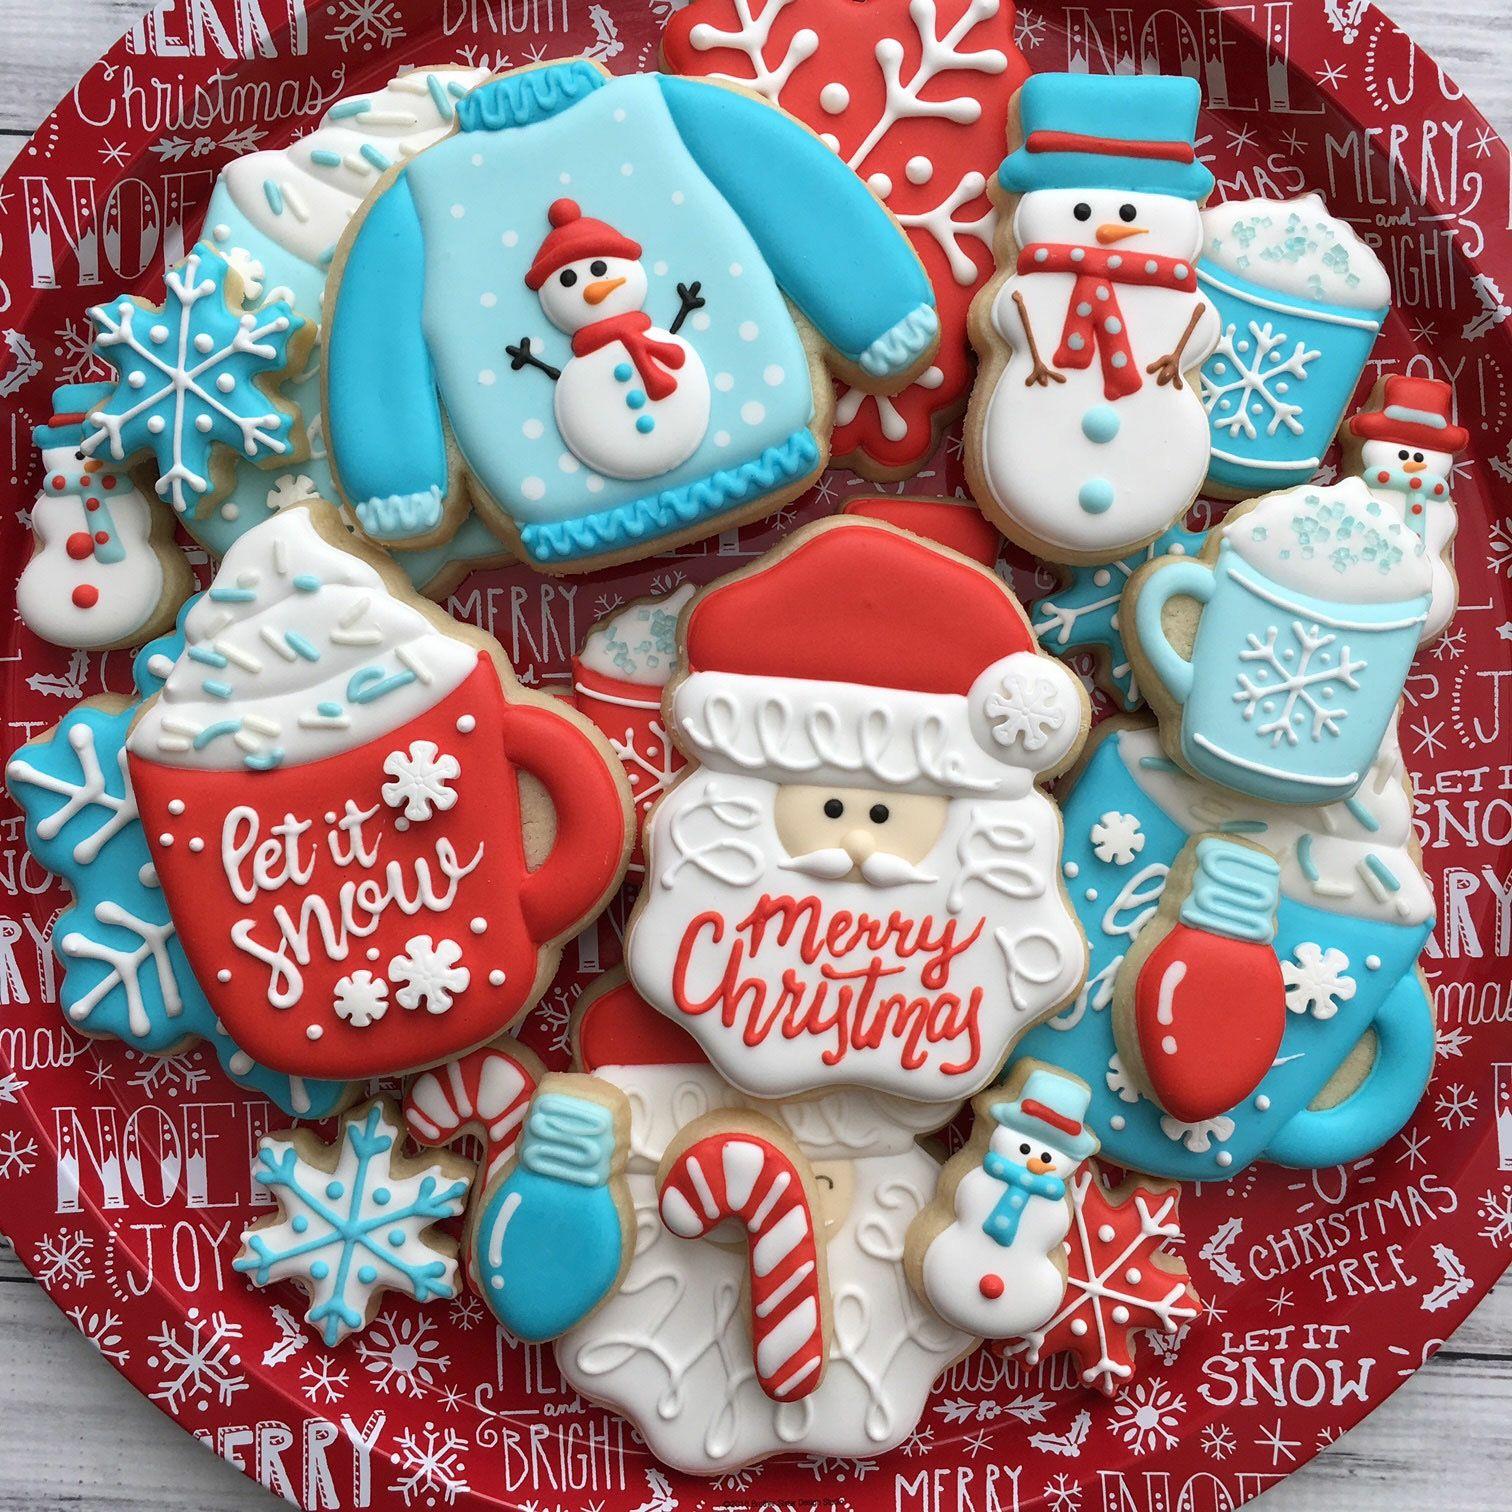 Christmas cookies by Banana Bakery Christmas cookies